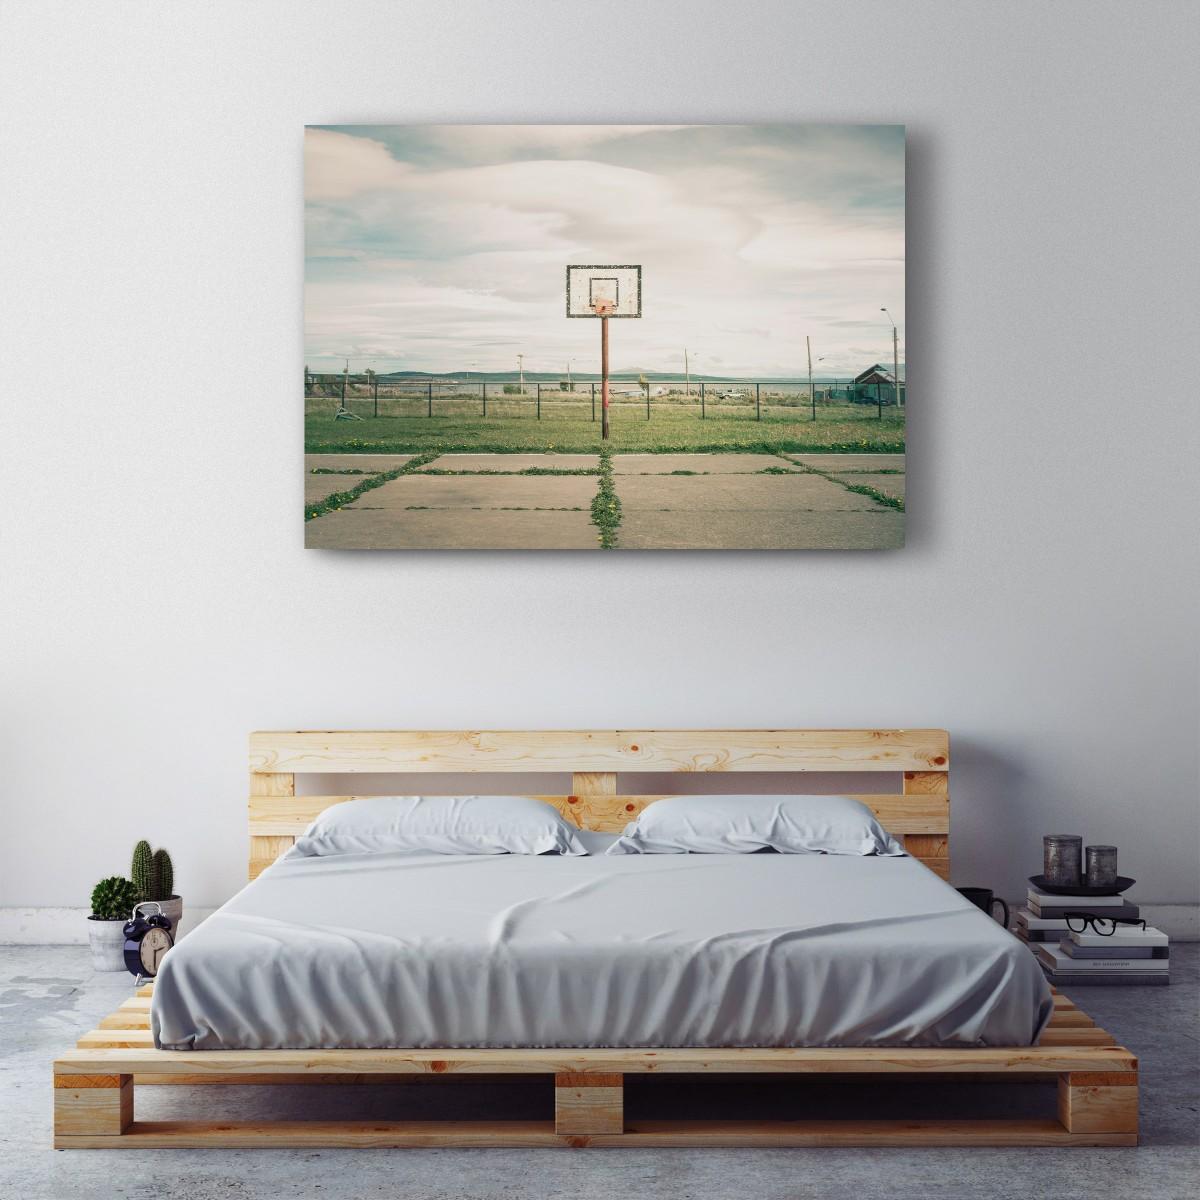 JOE MANIA / Modern Artprint Poster / Streetball Courts 1 (Puerto Natales, Chile) DIN A4 - A0